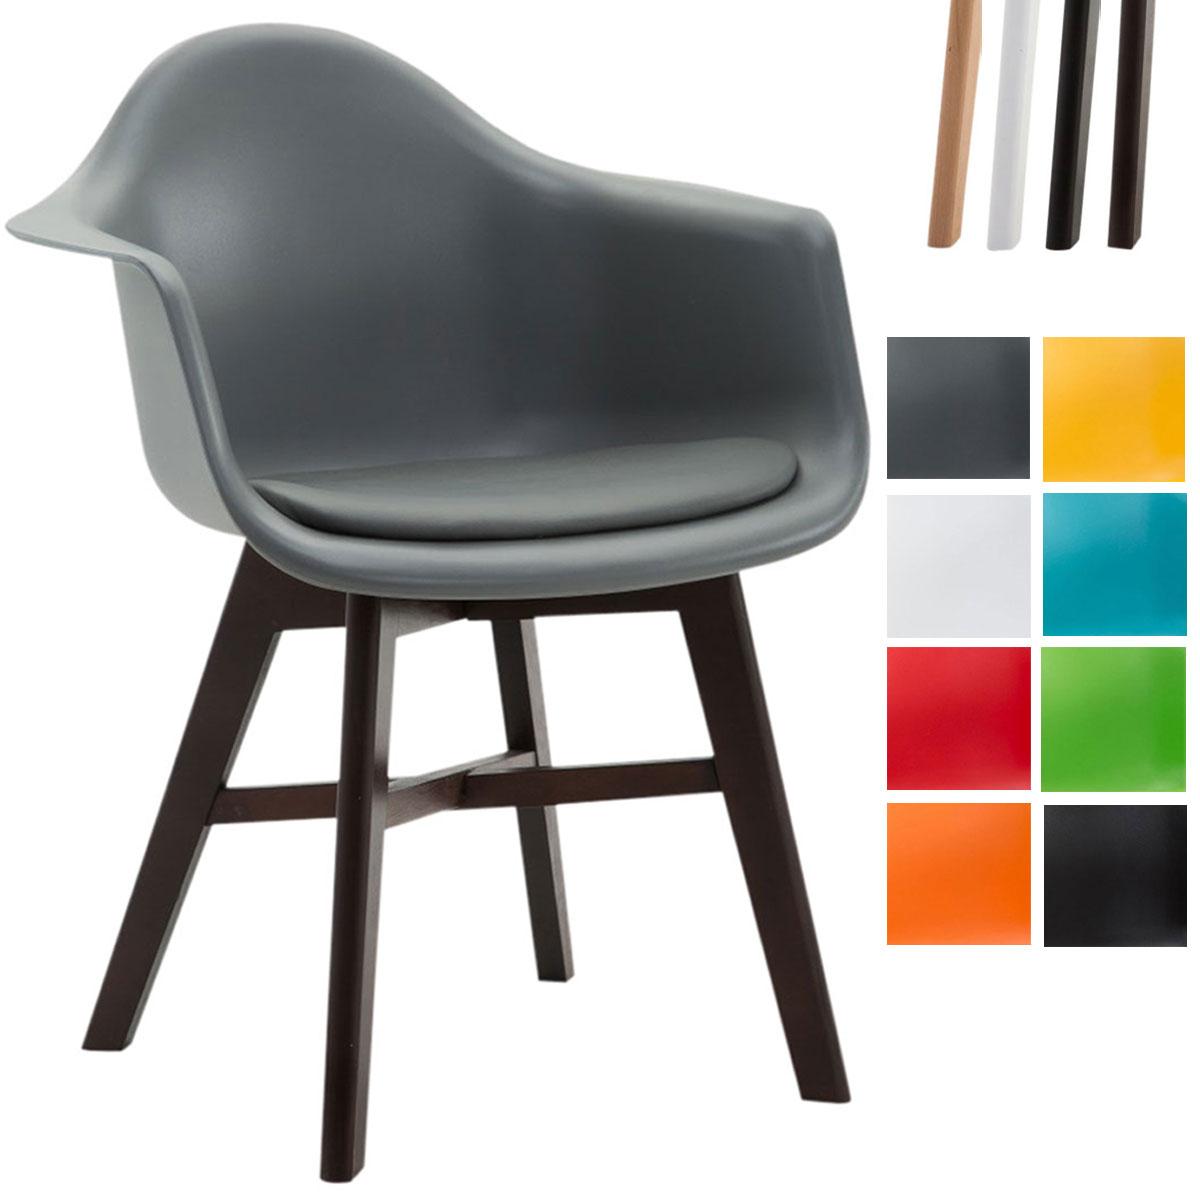 Chaise salle manger calgary similicuir bois fauteuil for Chaise visiteur